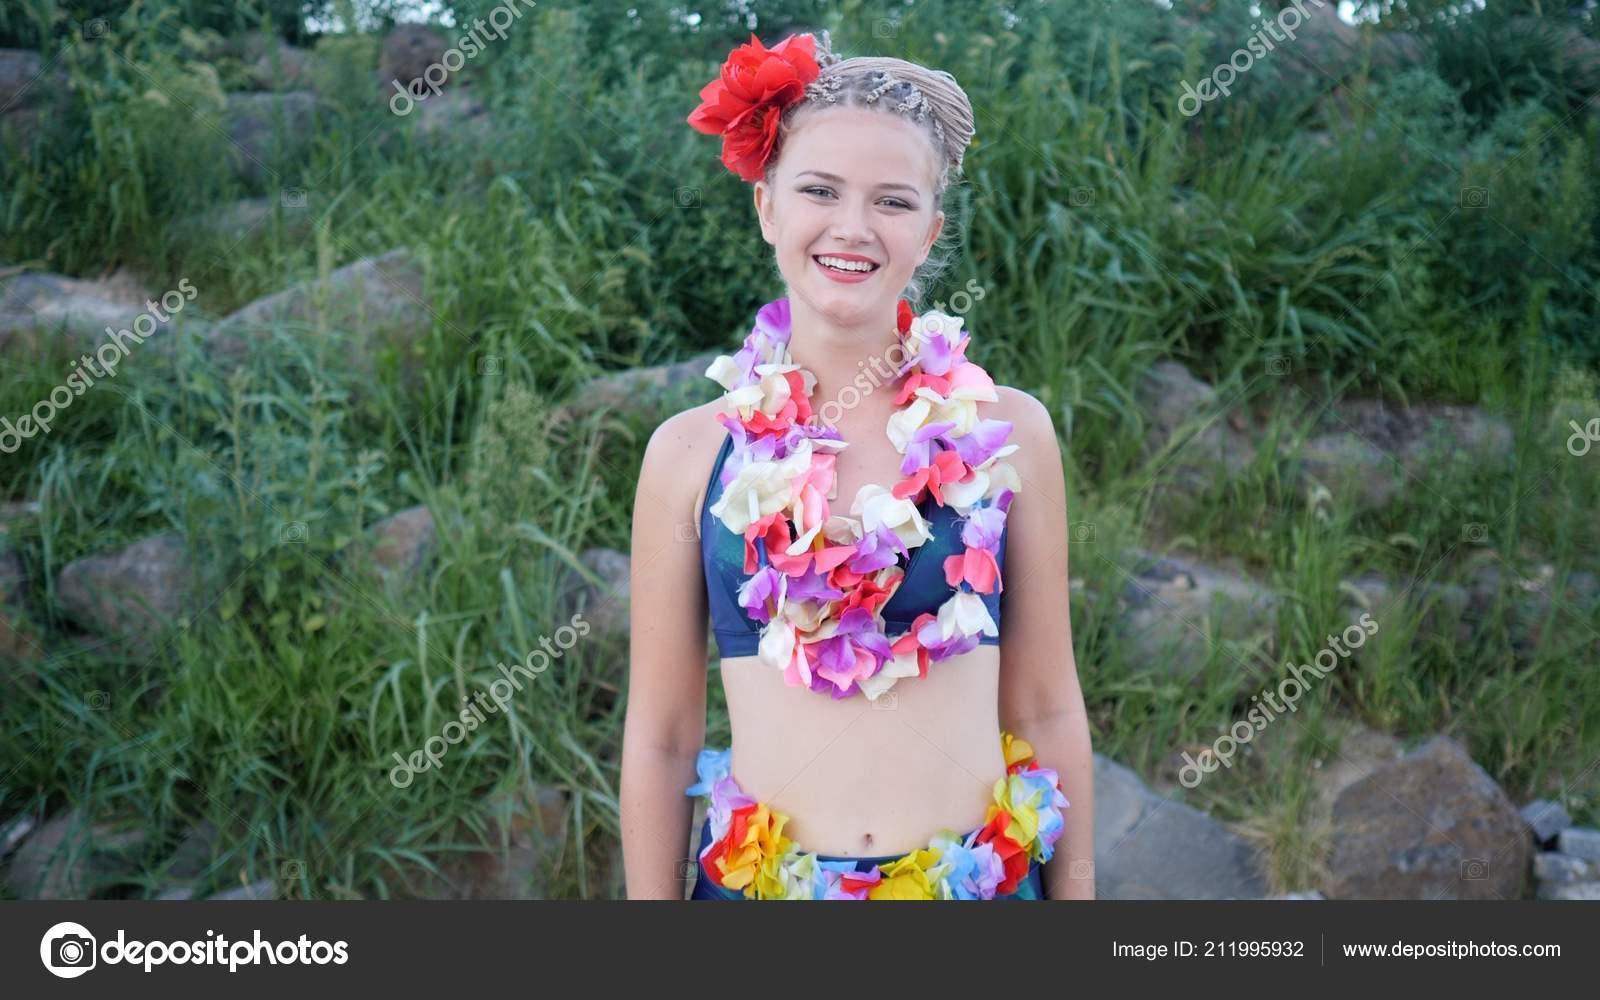 Hawaii Frau Mit Lei Blumengirlande Rosa Orchideen Schönen Lächeln